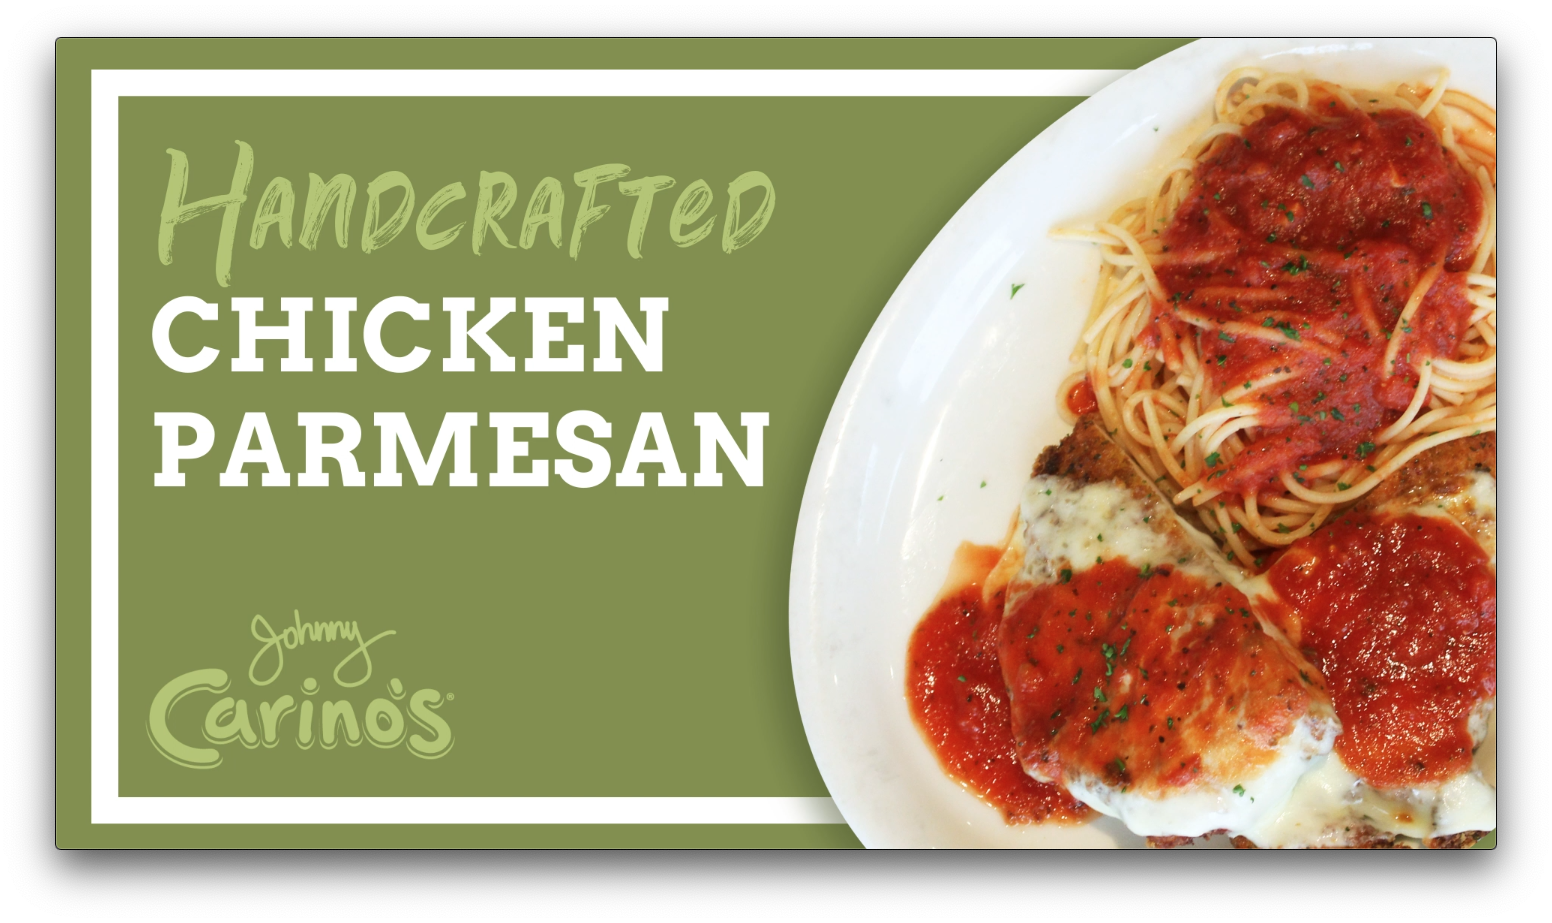 johnny carino's chicken parmesan motion graphic screenshot